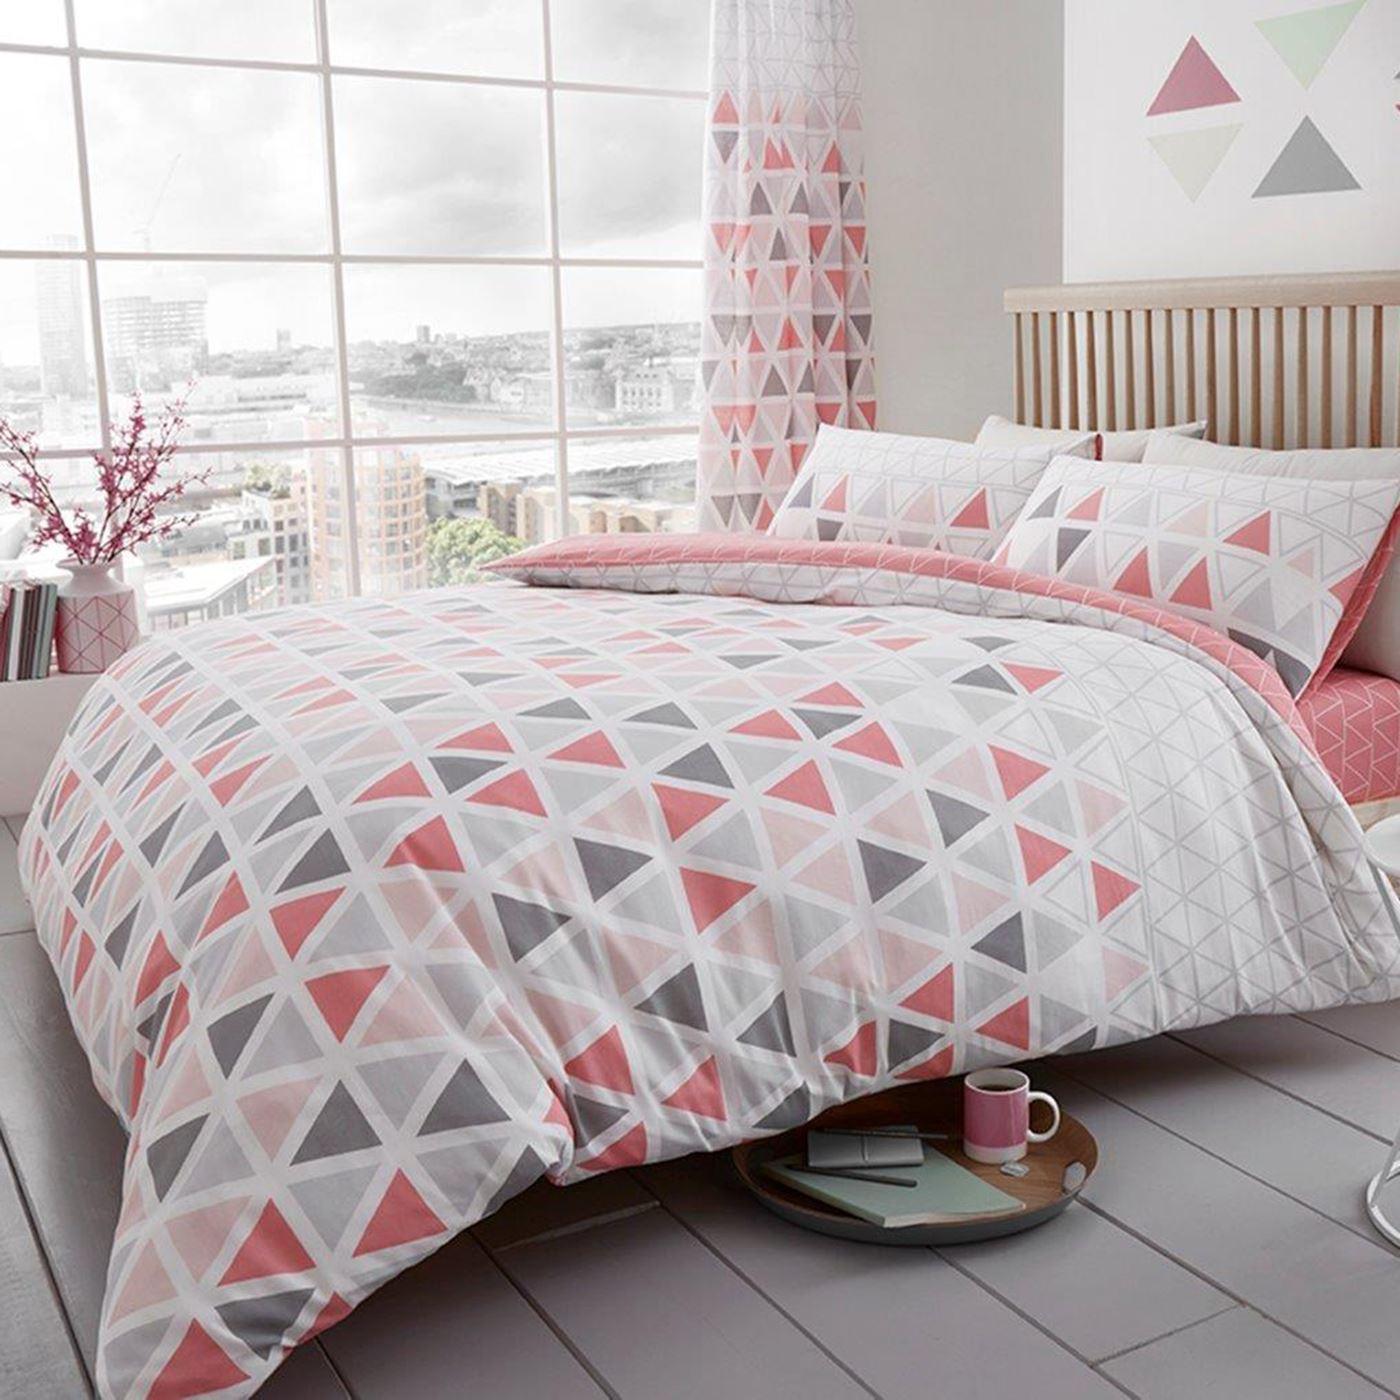 geo triangle set housse de couette simple r versible g om trique literie rose ebay. Black Bedroom Furniture Sets. Home Design Ideas